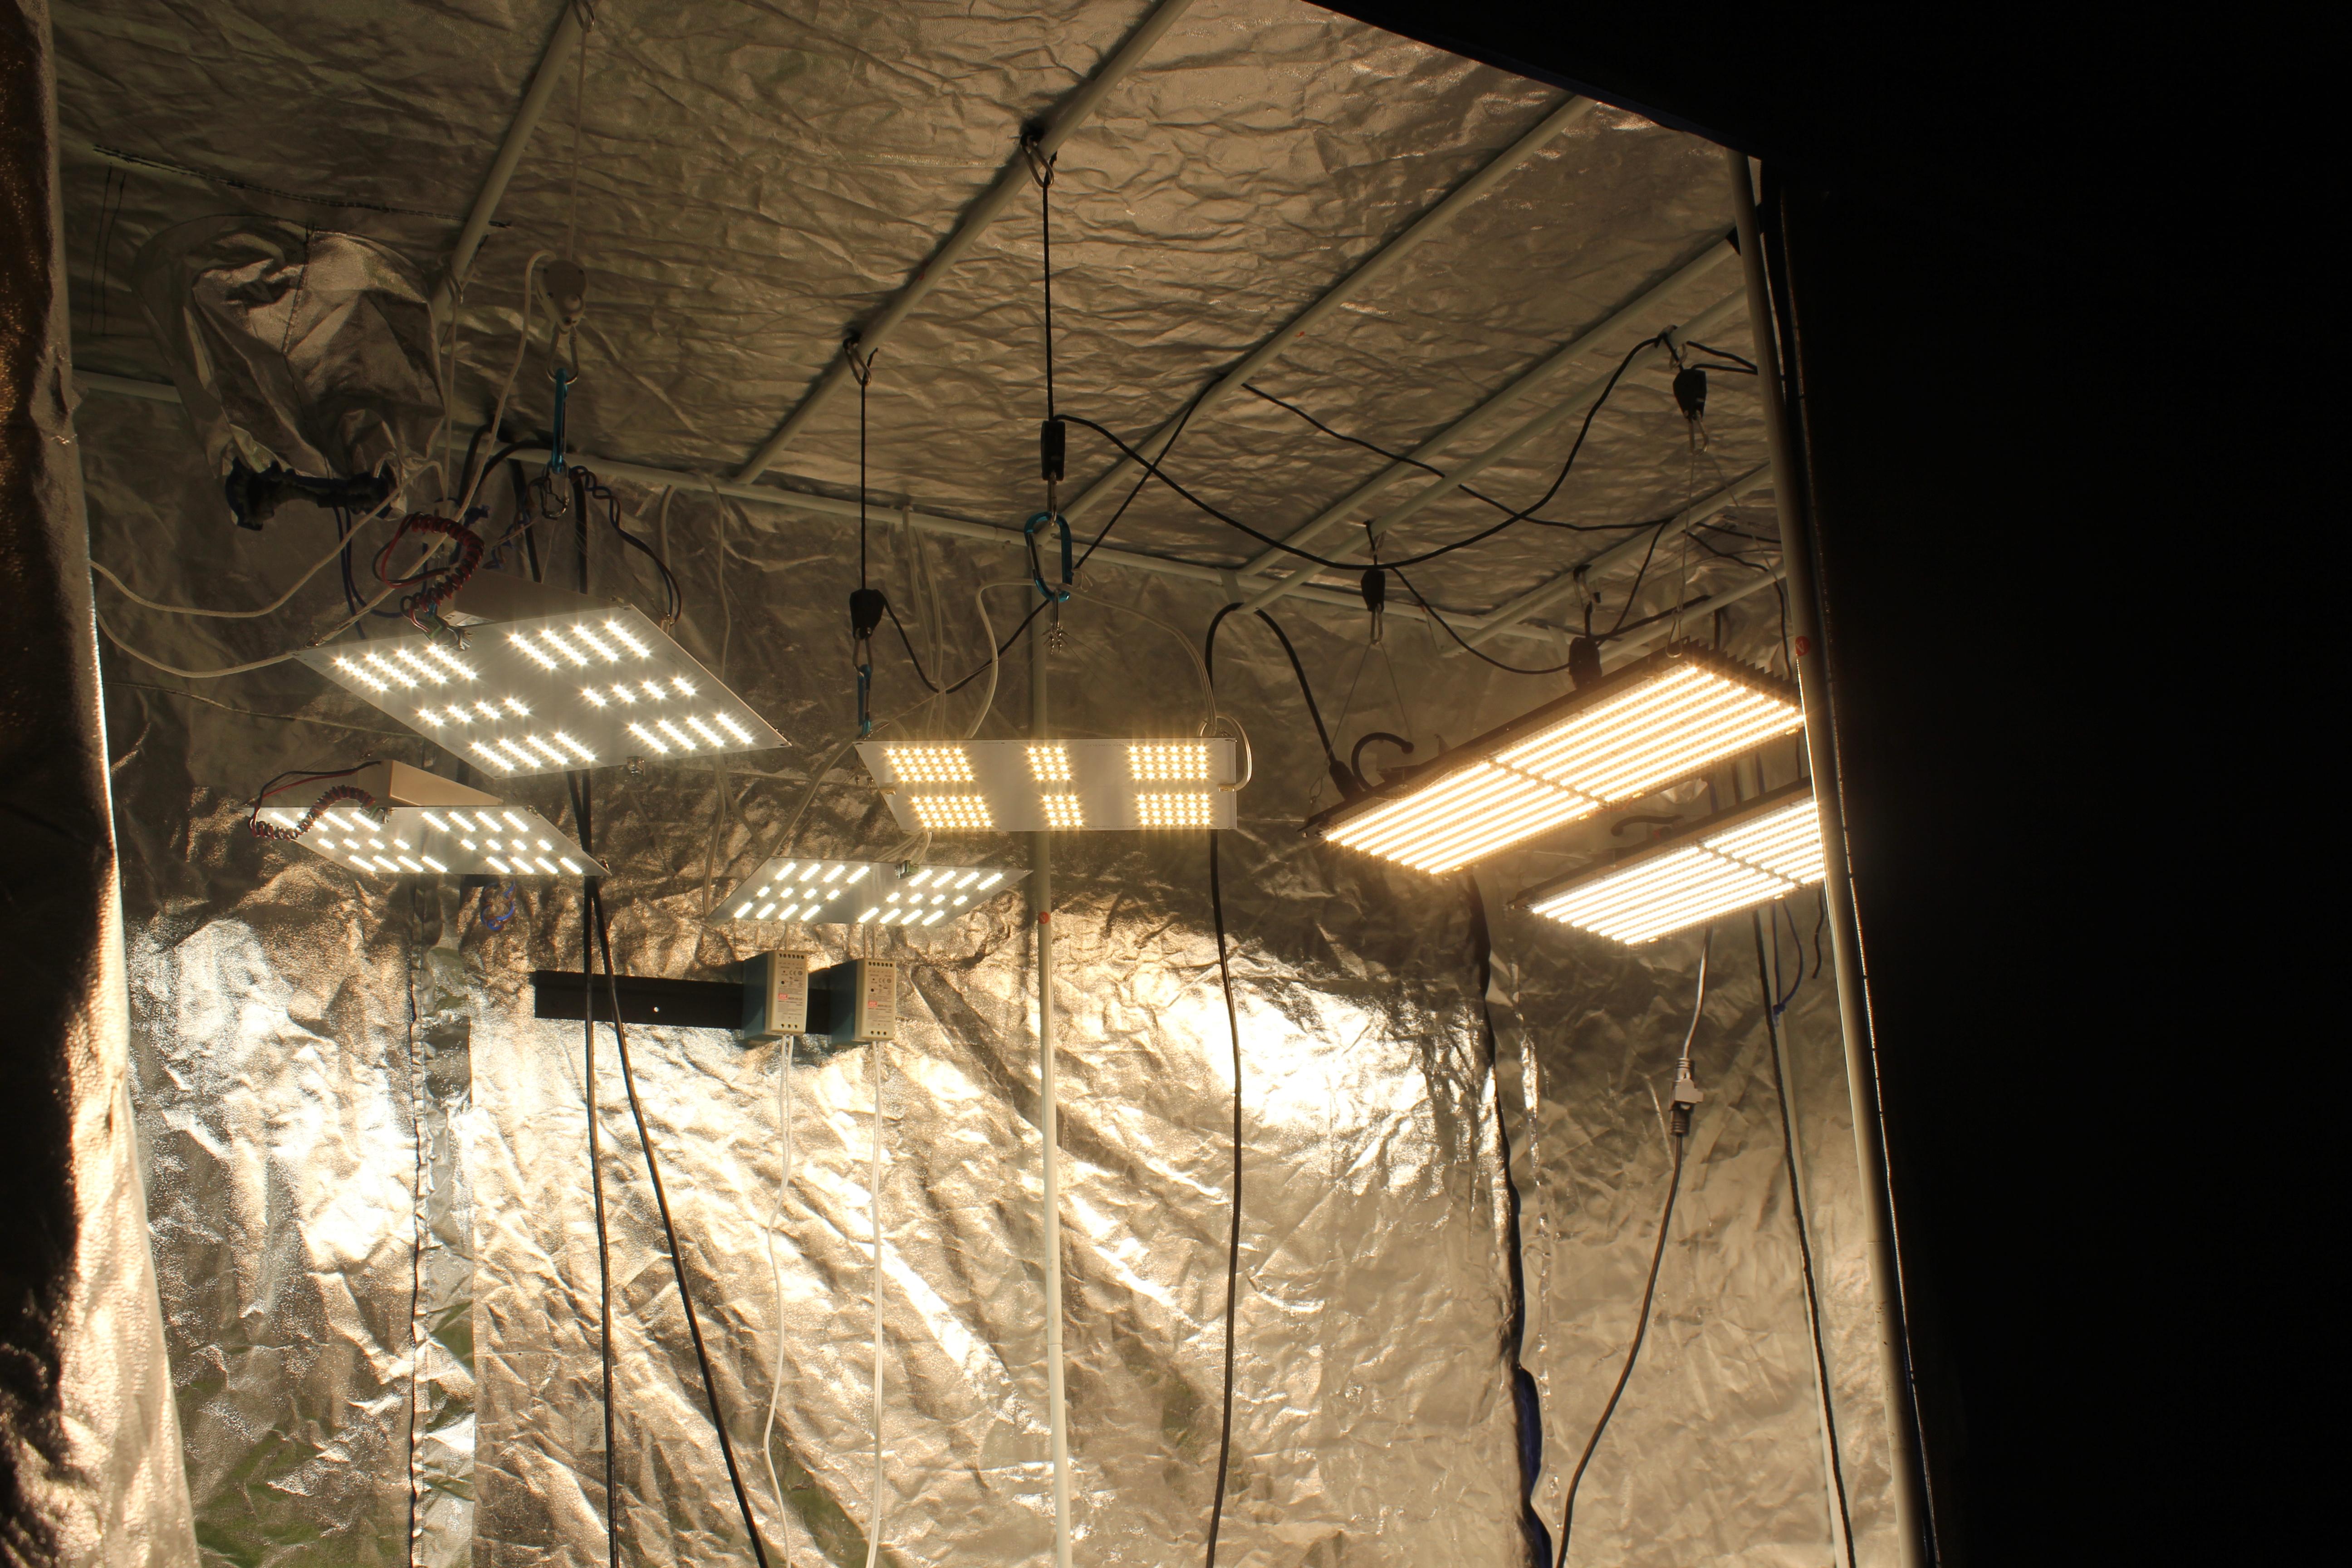 Horticulture Lighting Group 260 Watt XL Quantum Board LED Kit